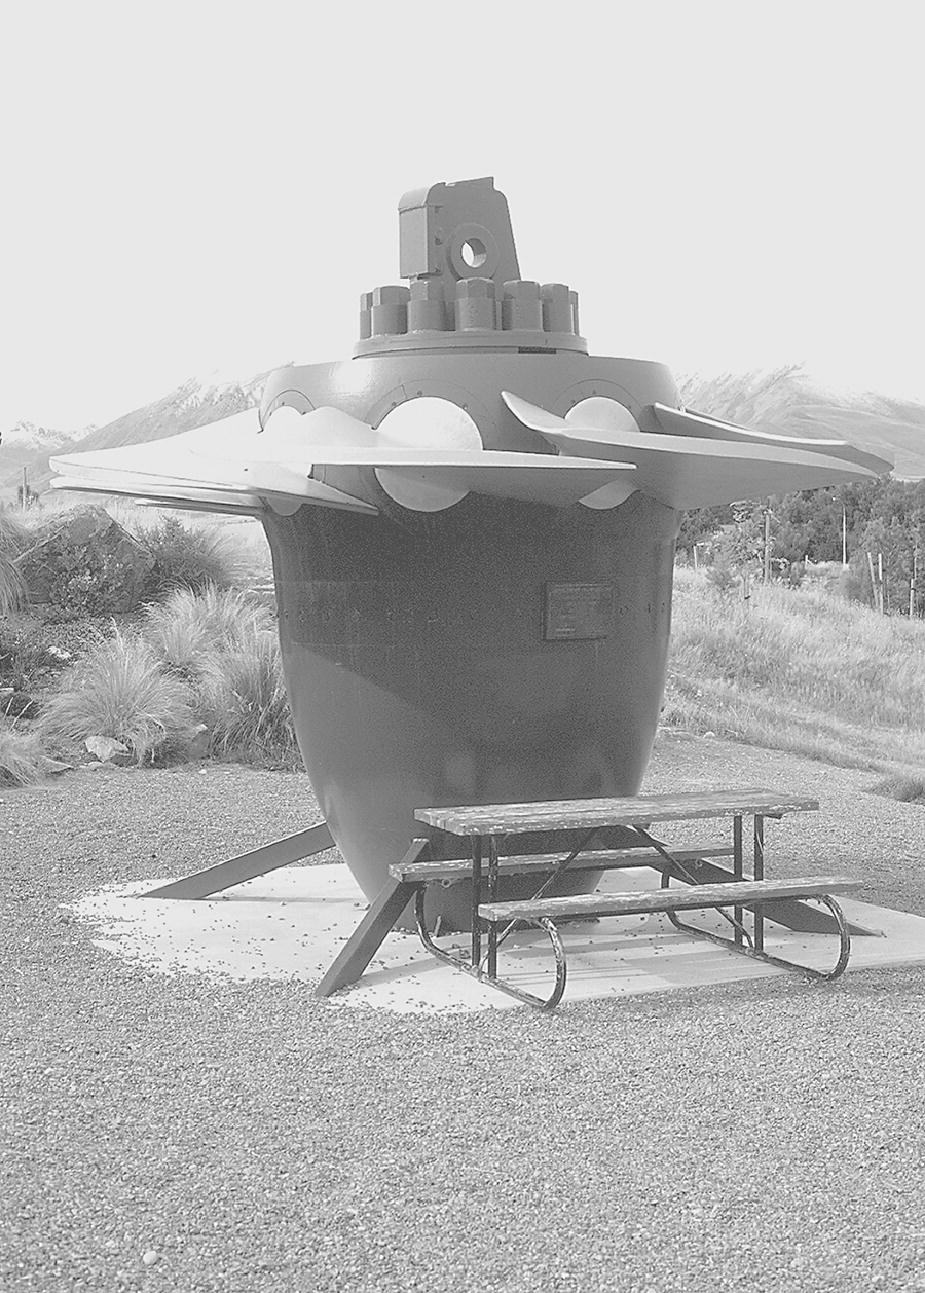 PLINY FISK III  AMERICA/'S FOREMOST LANDSCAPE ARCHITECT